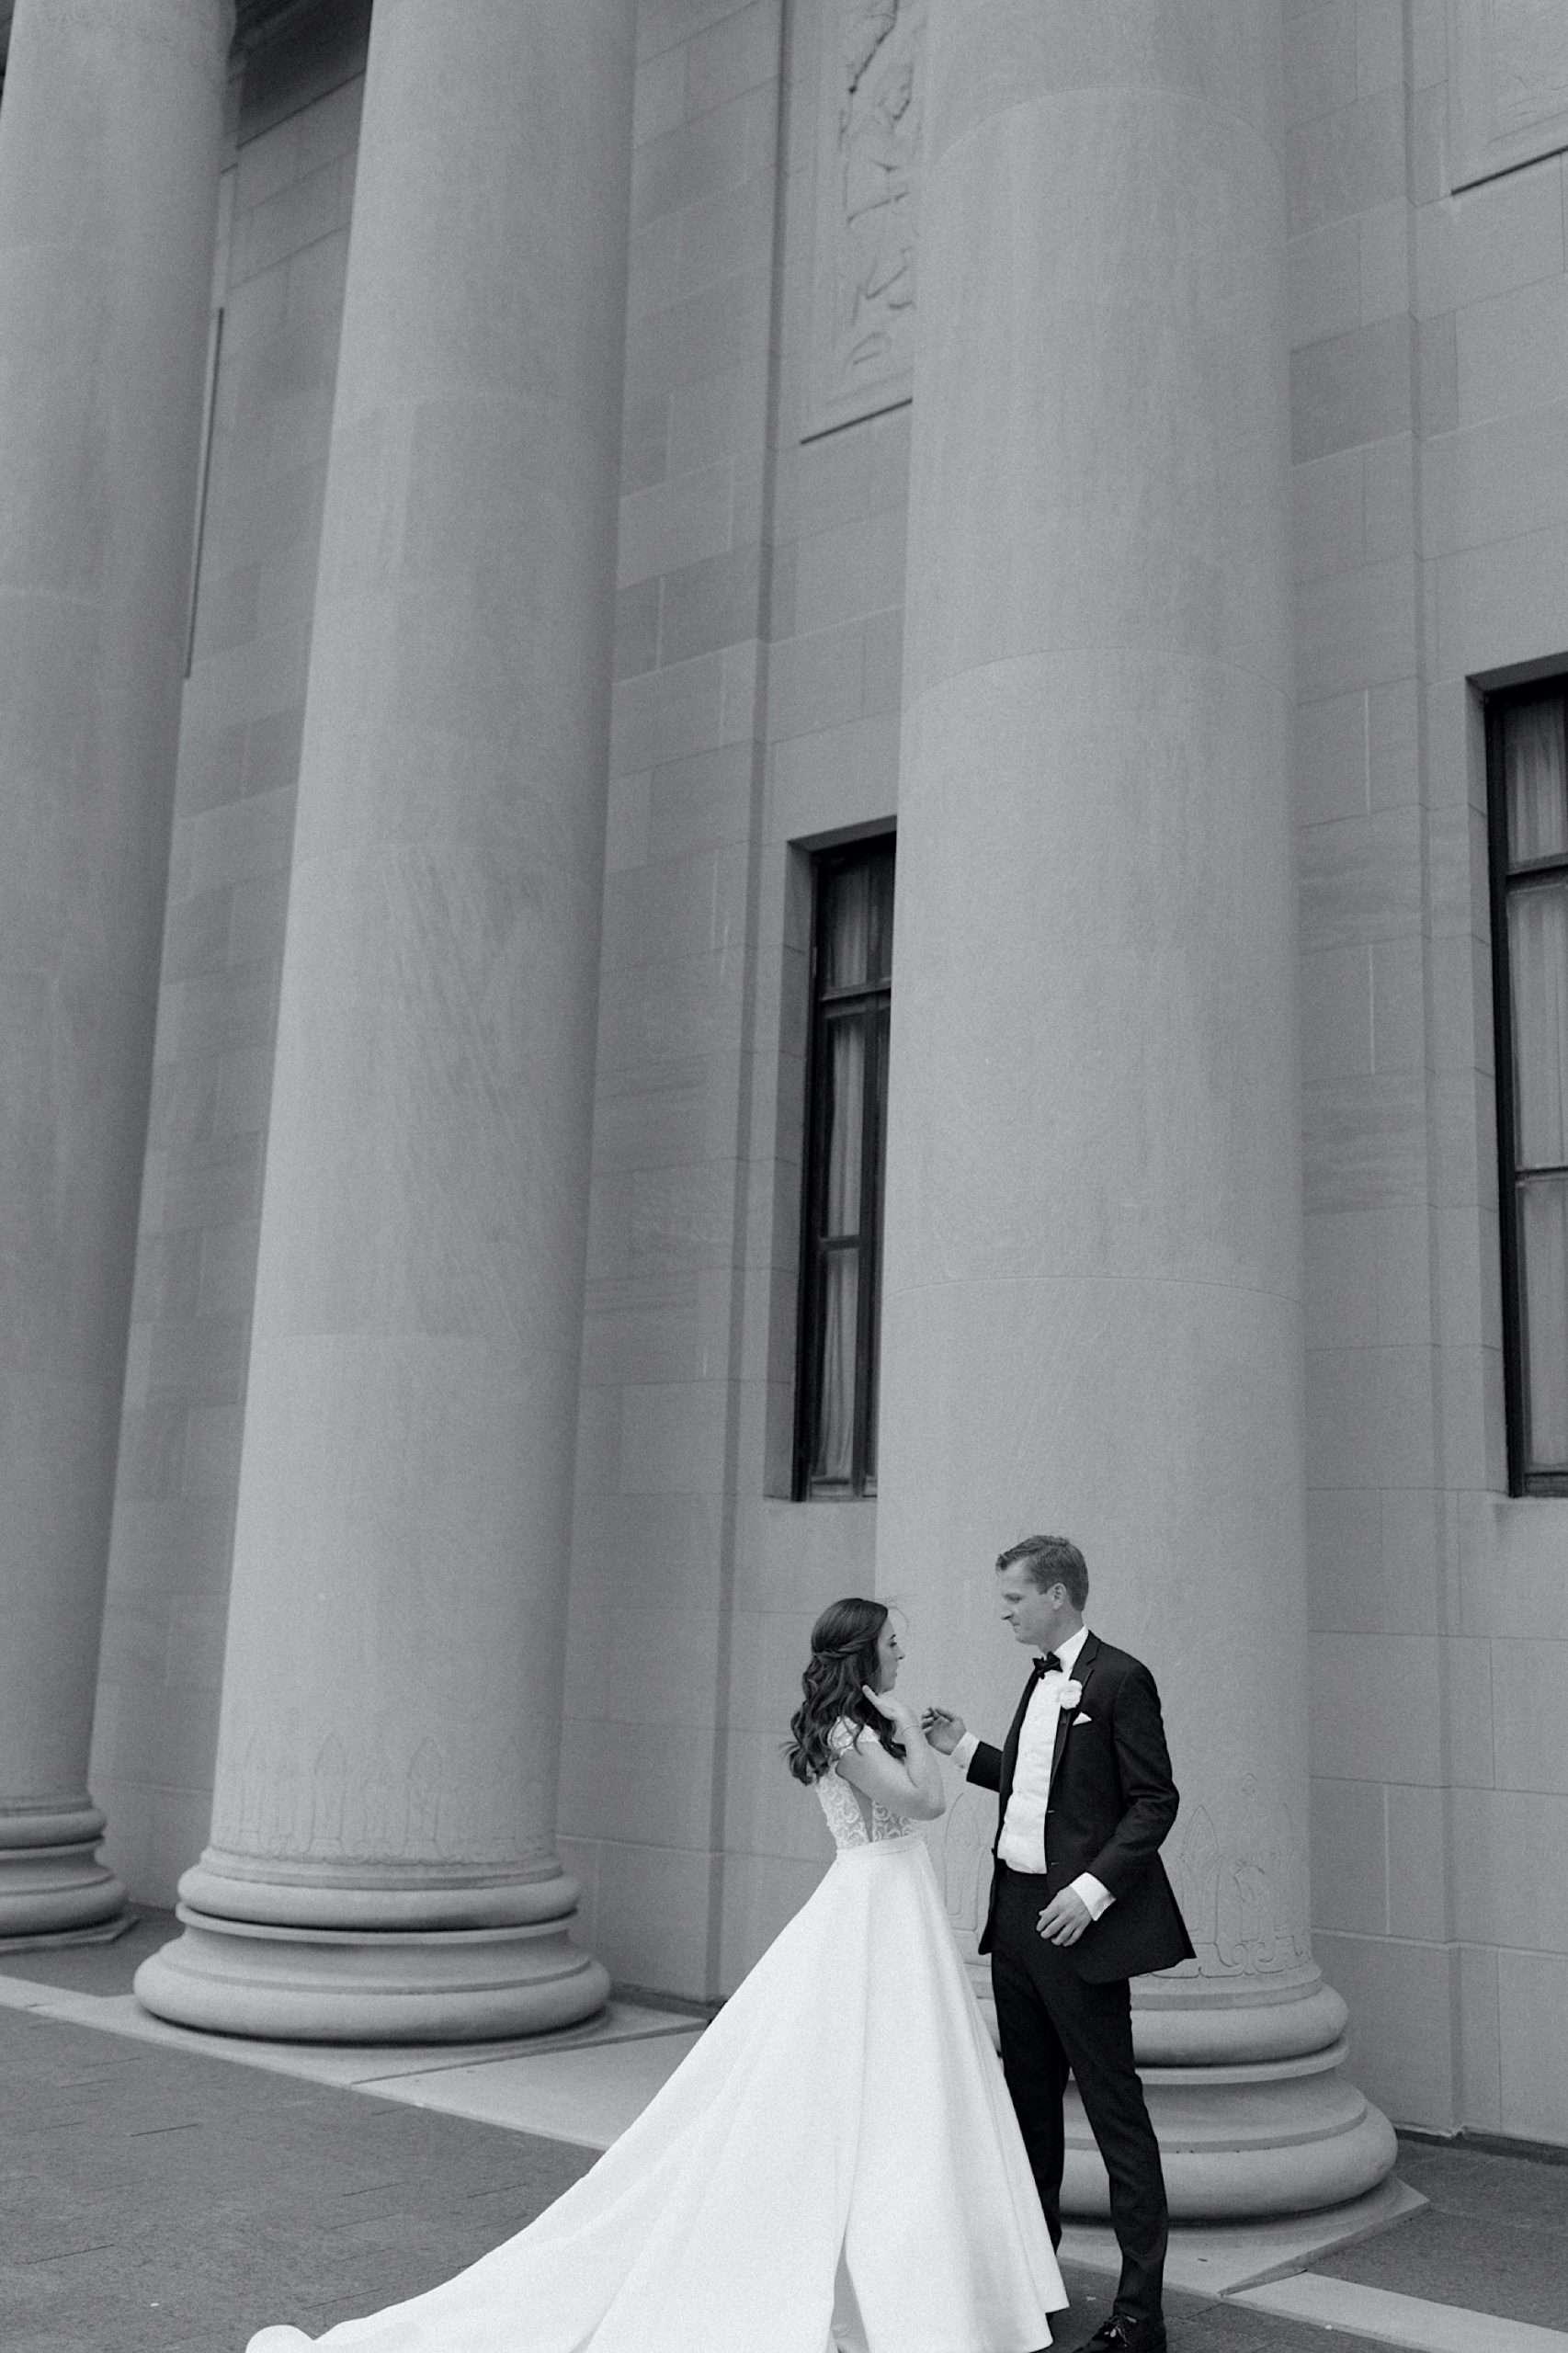 Kansas City wedding at the nelson-Atkins museum